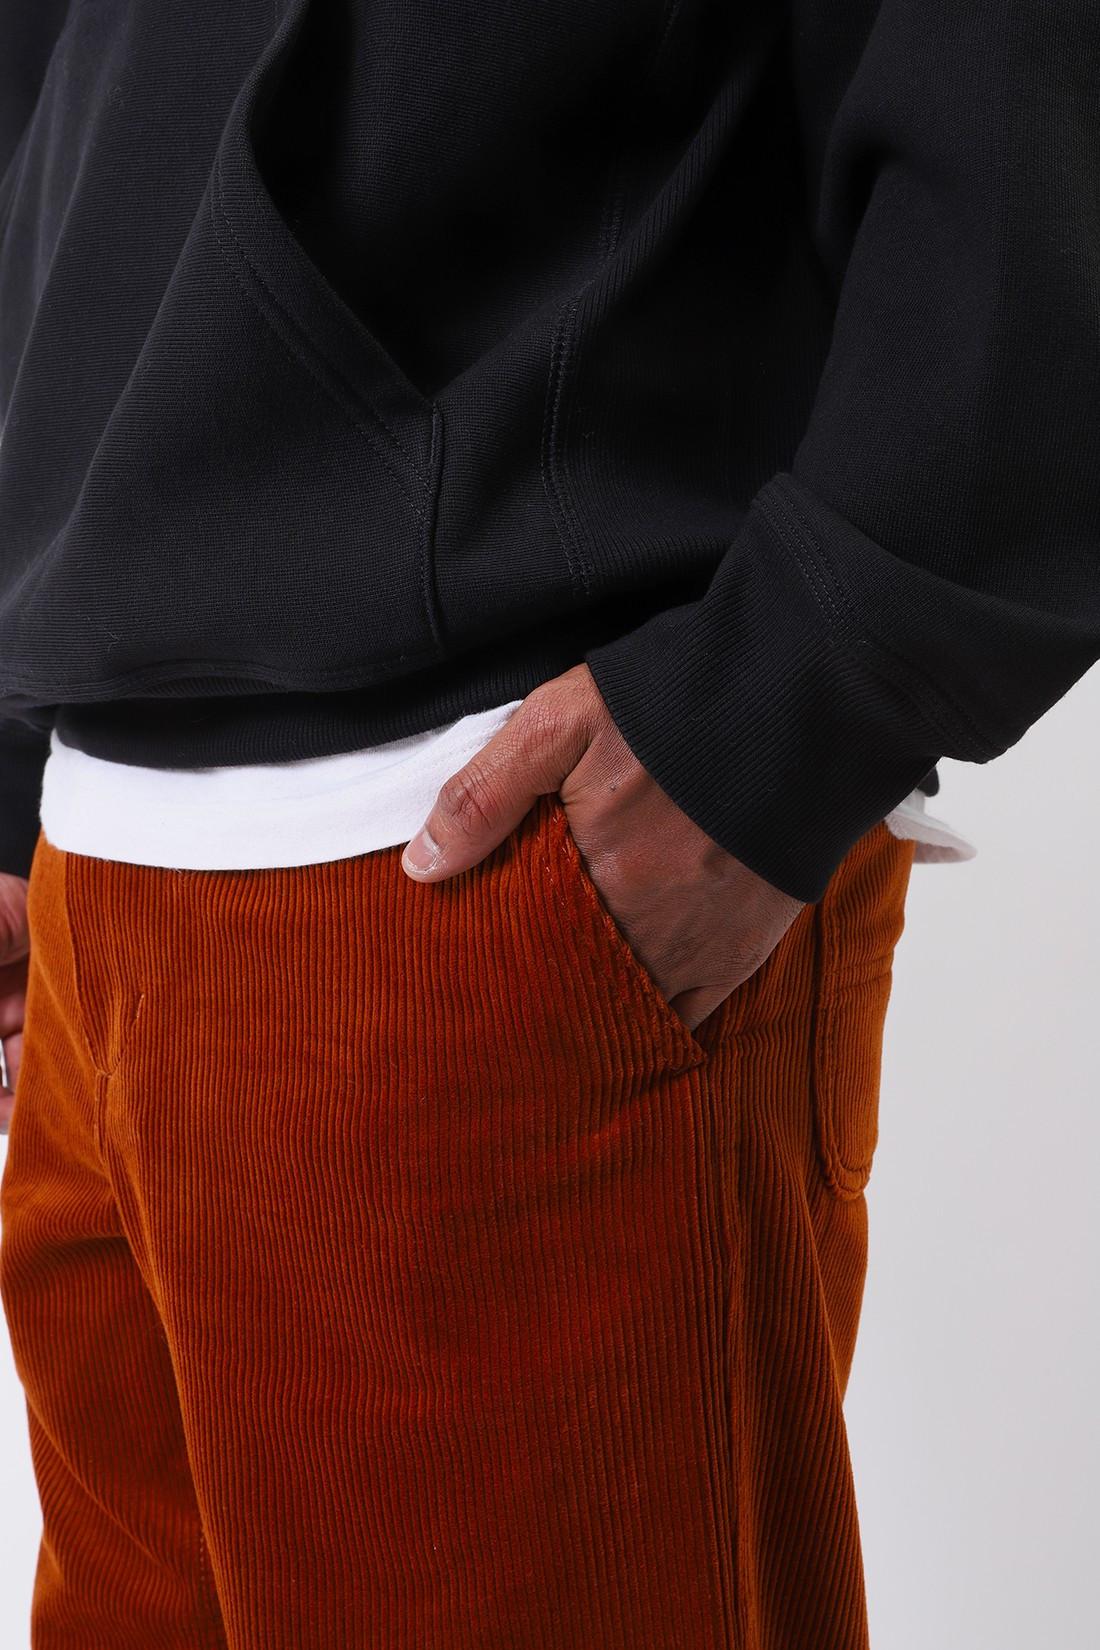 CARHARTT WIP / Flint pant corduroy Brandy